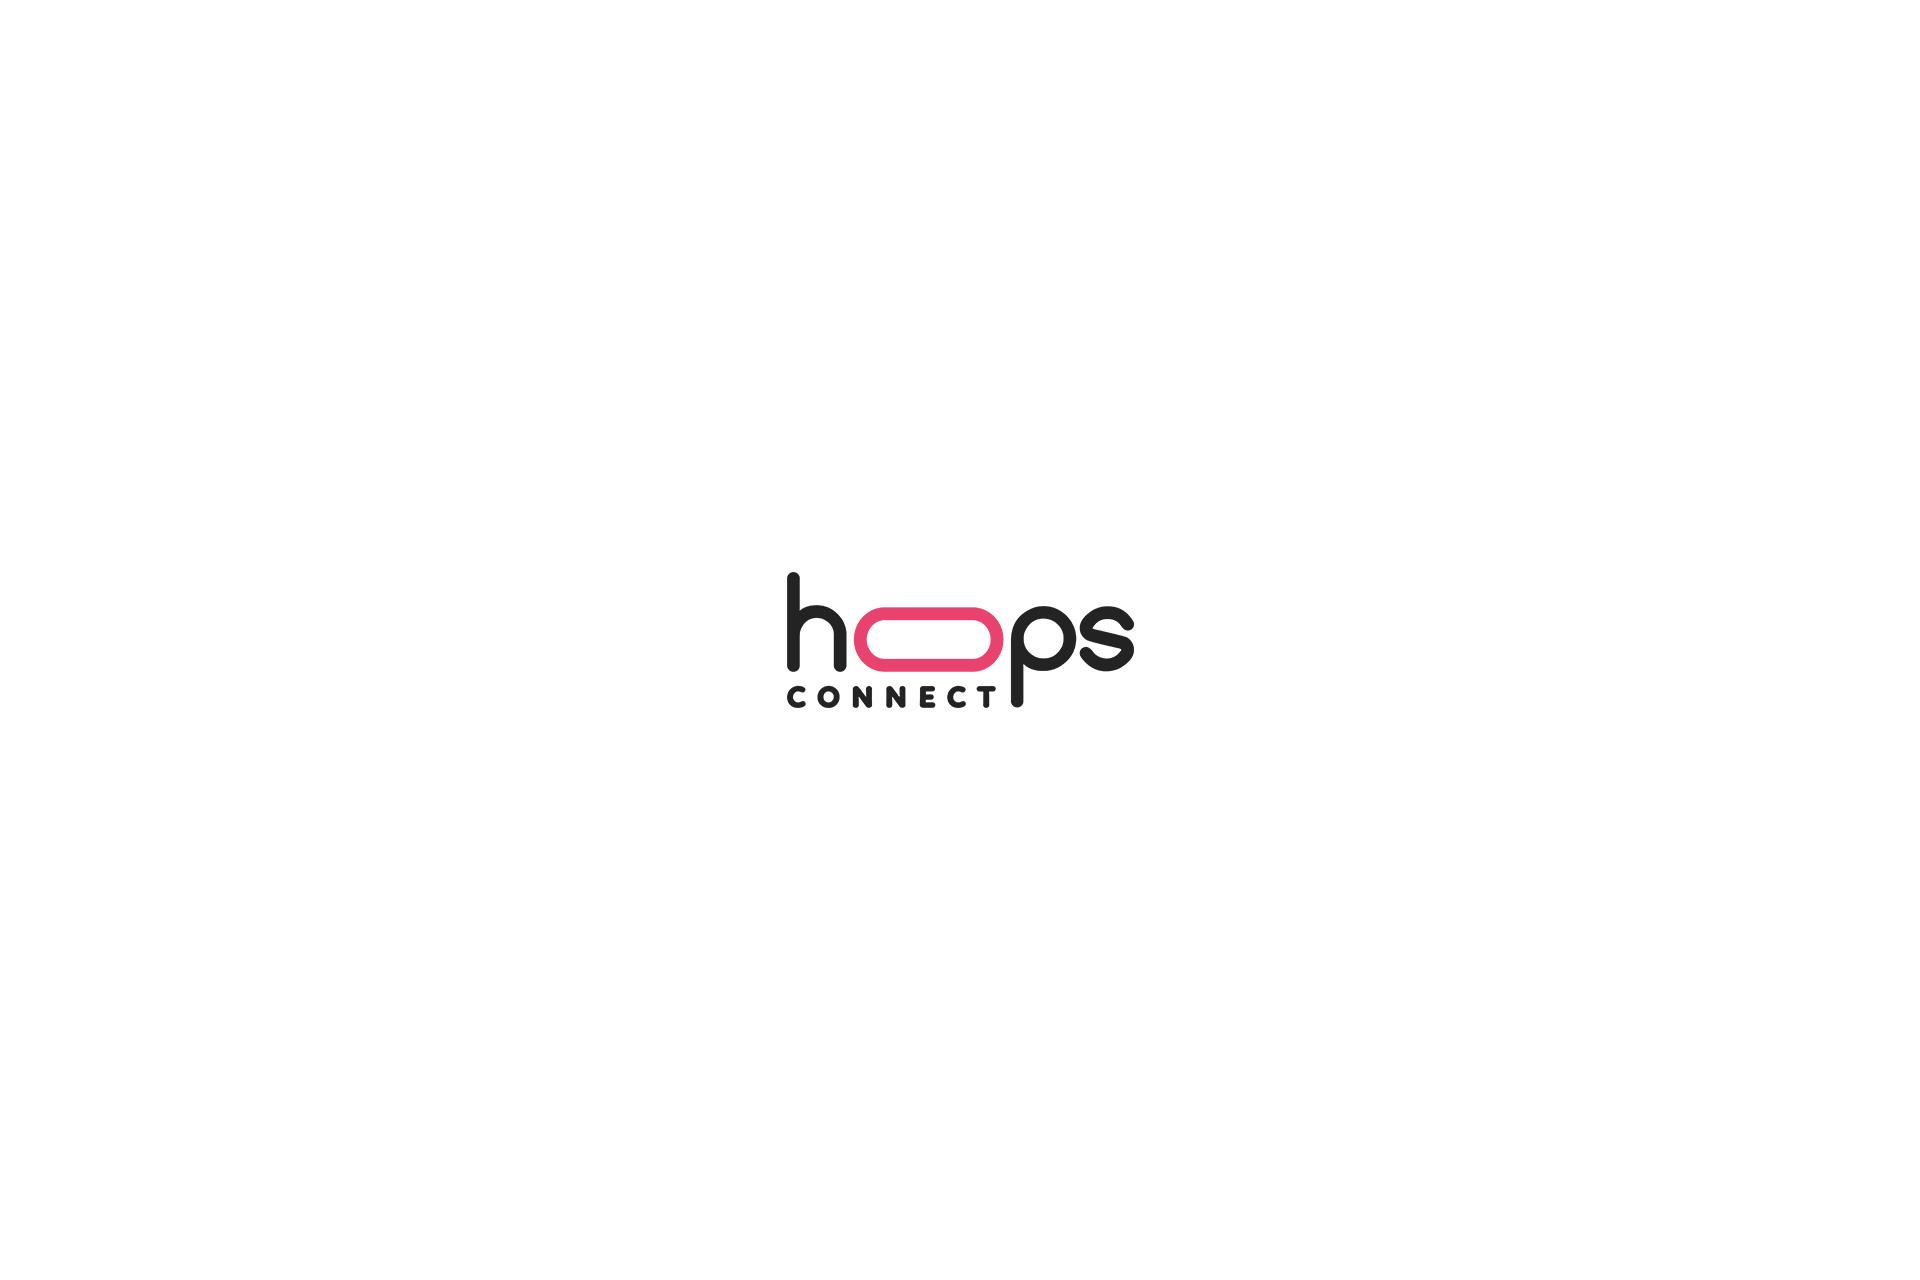 Hoops-Connect-branding-by-Orfi-Media